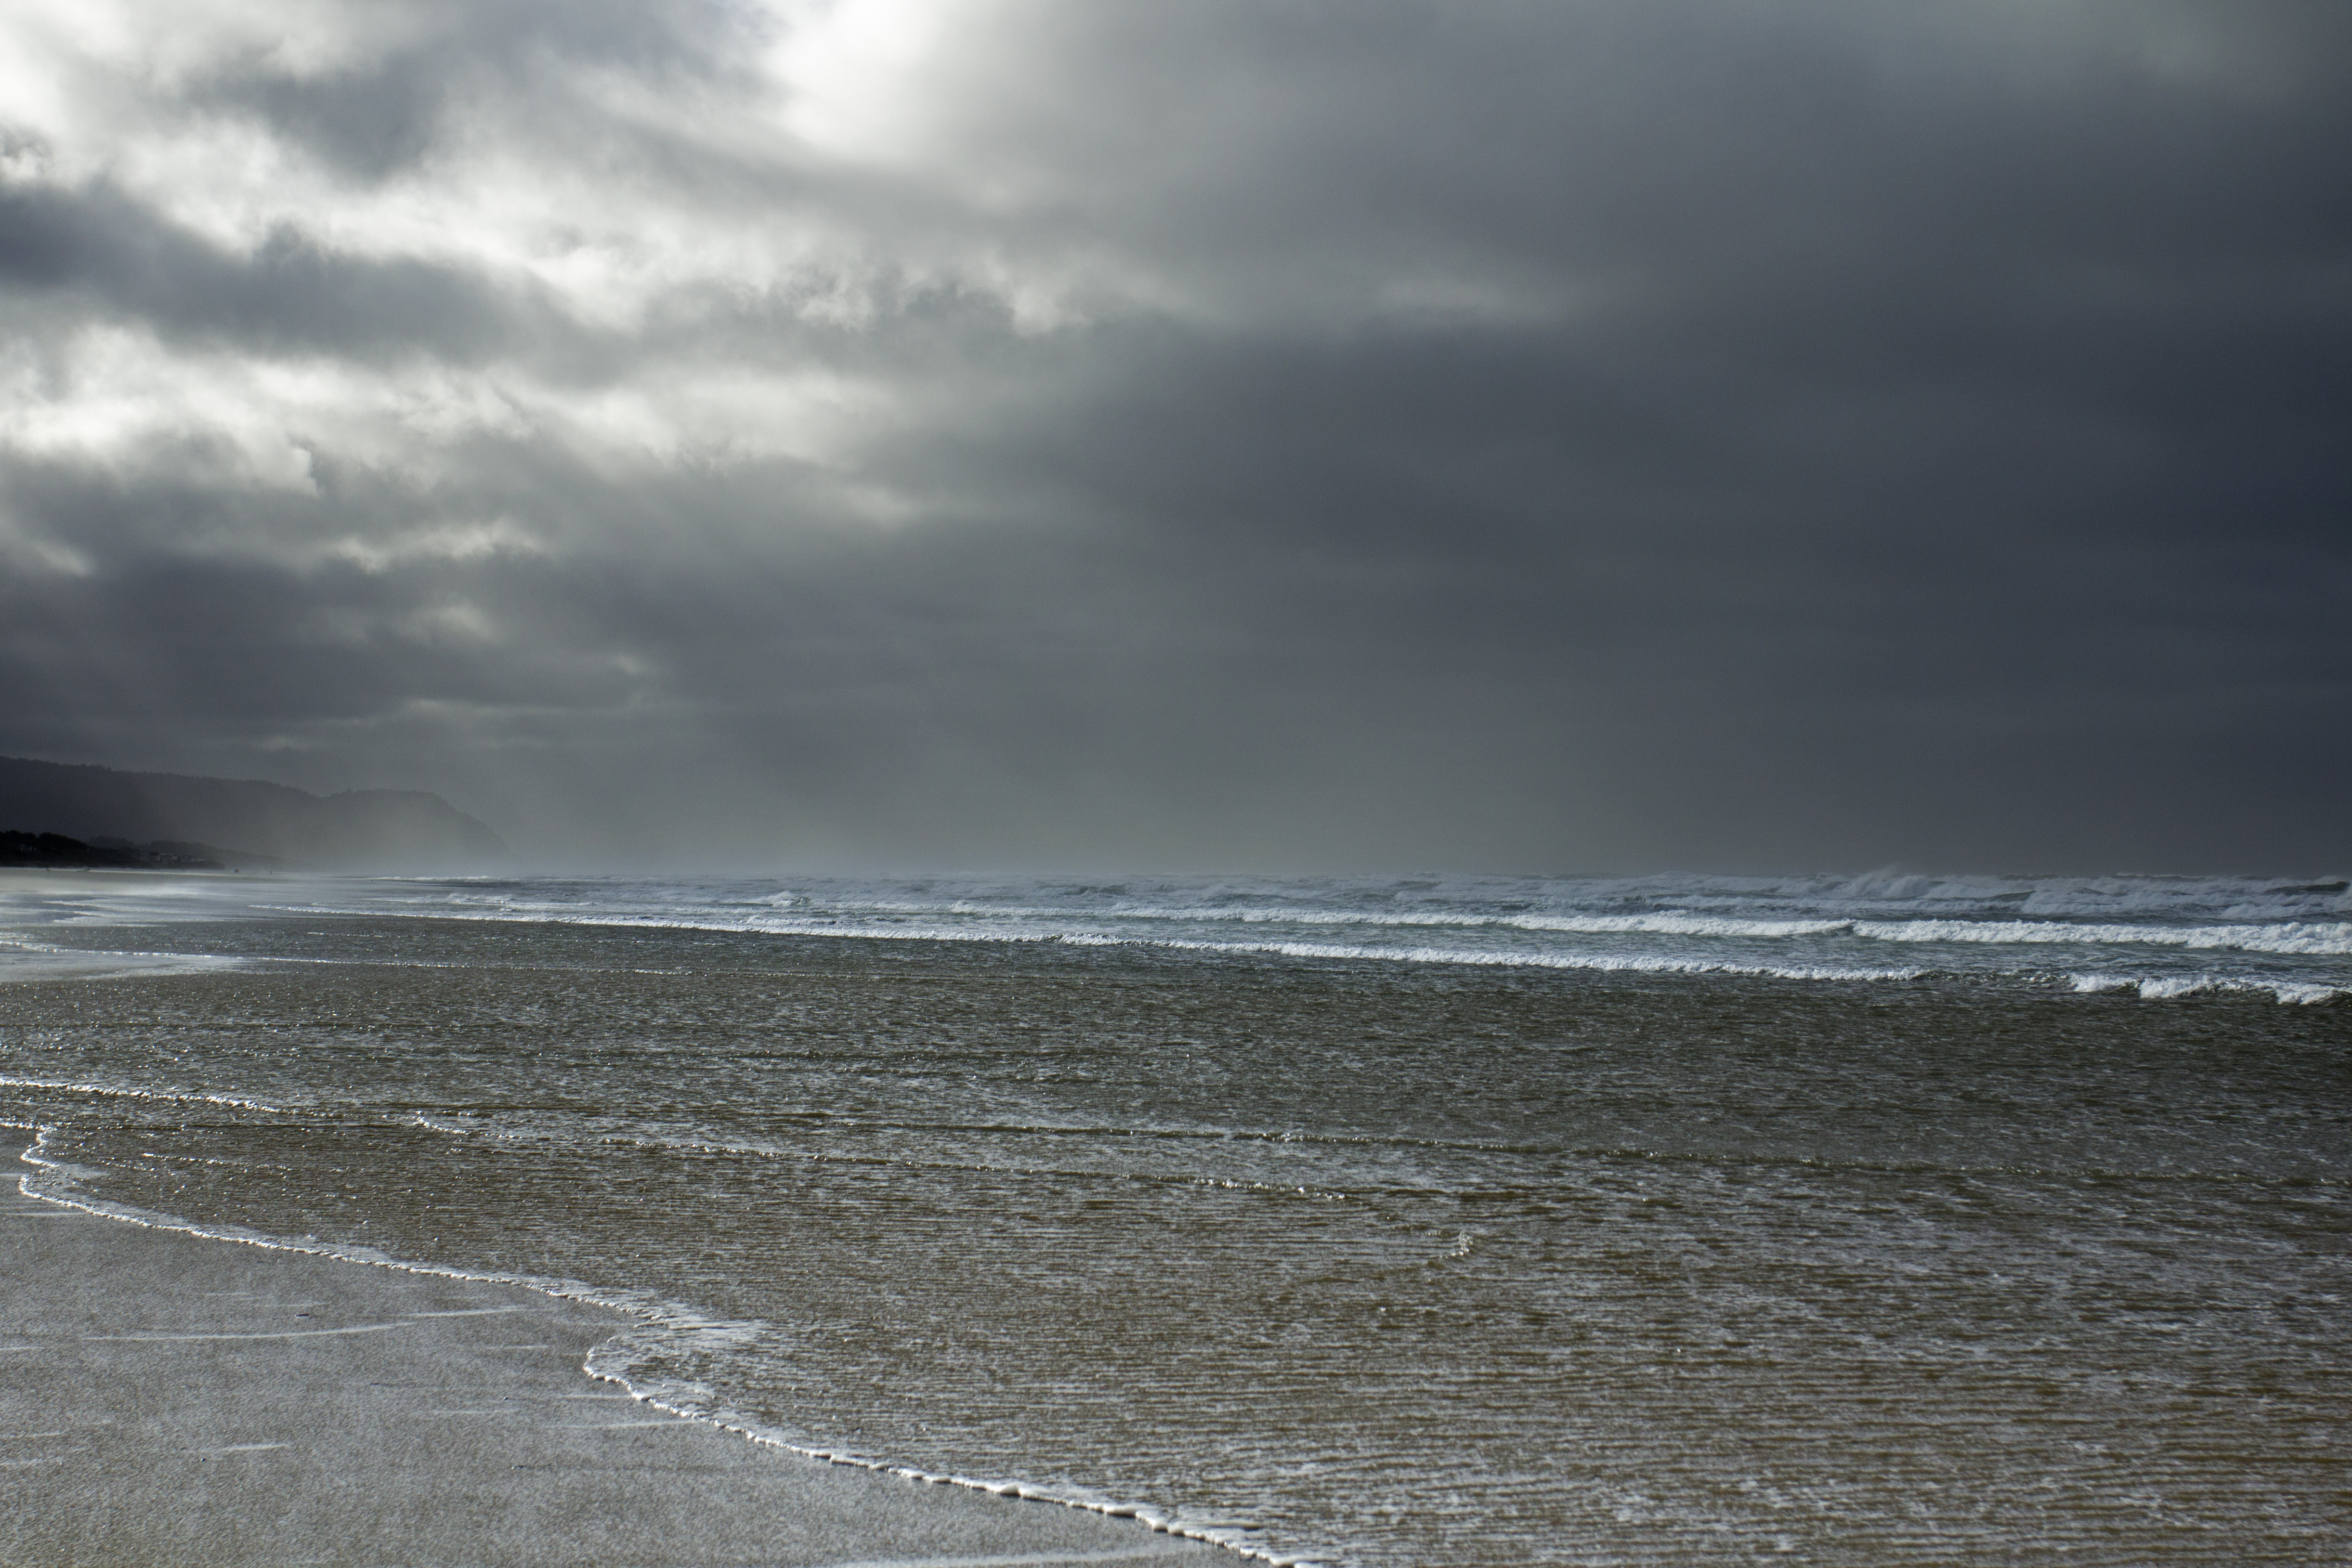 Winter storm on coast, oregon photo